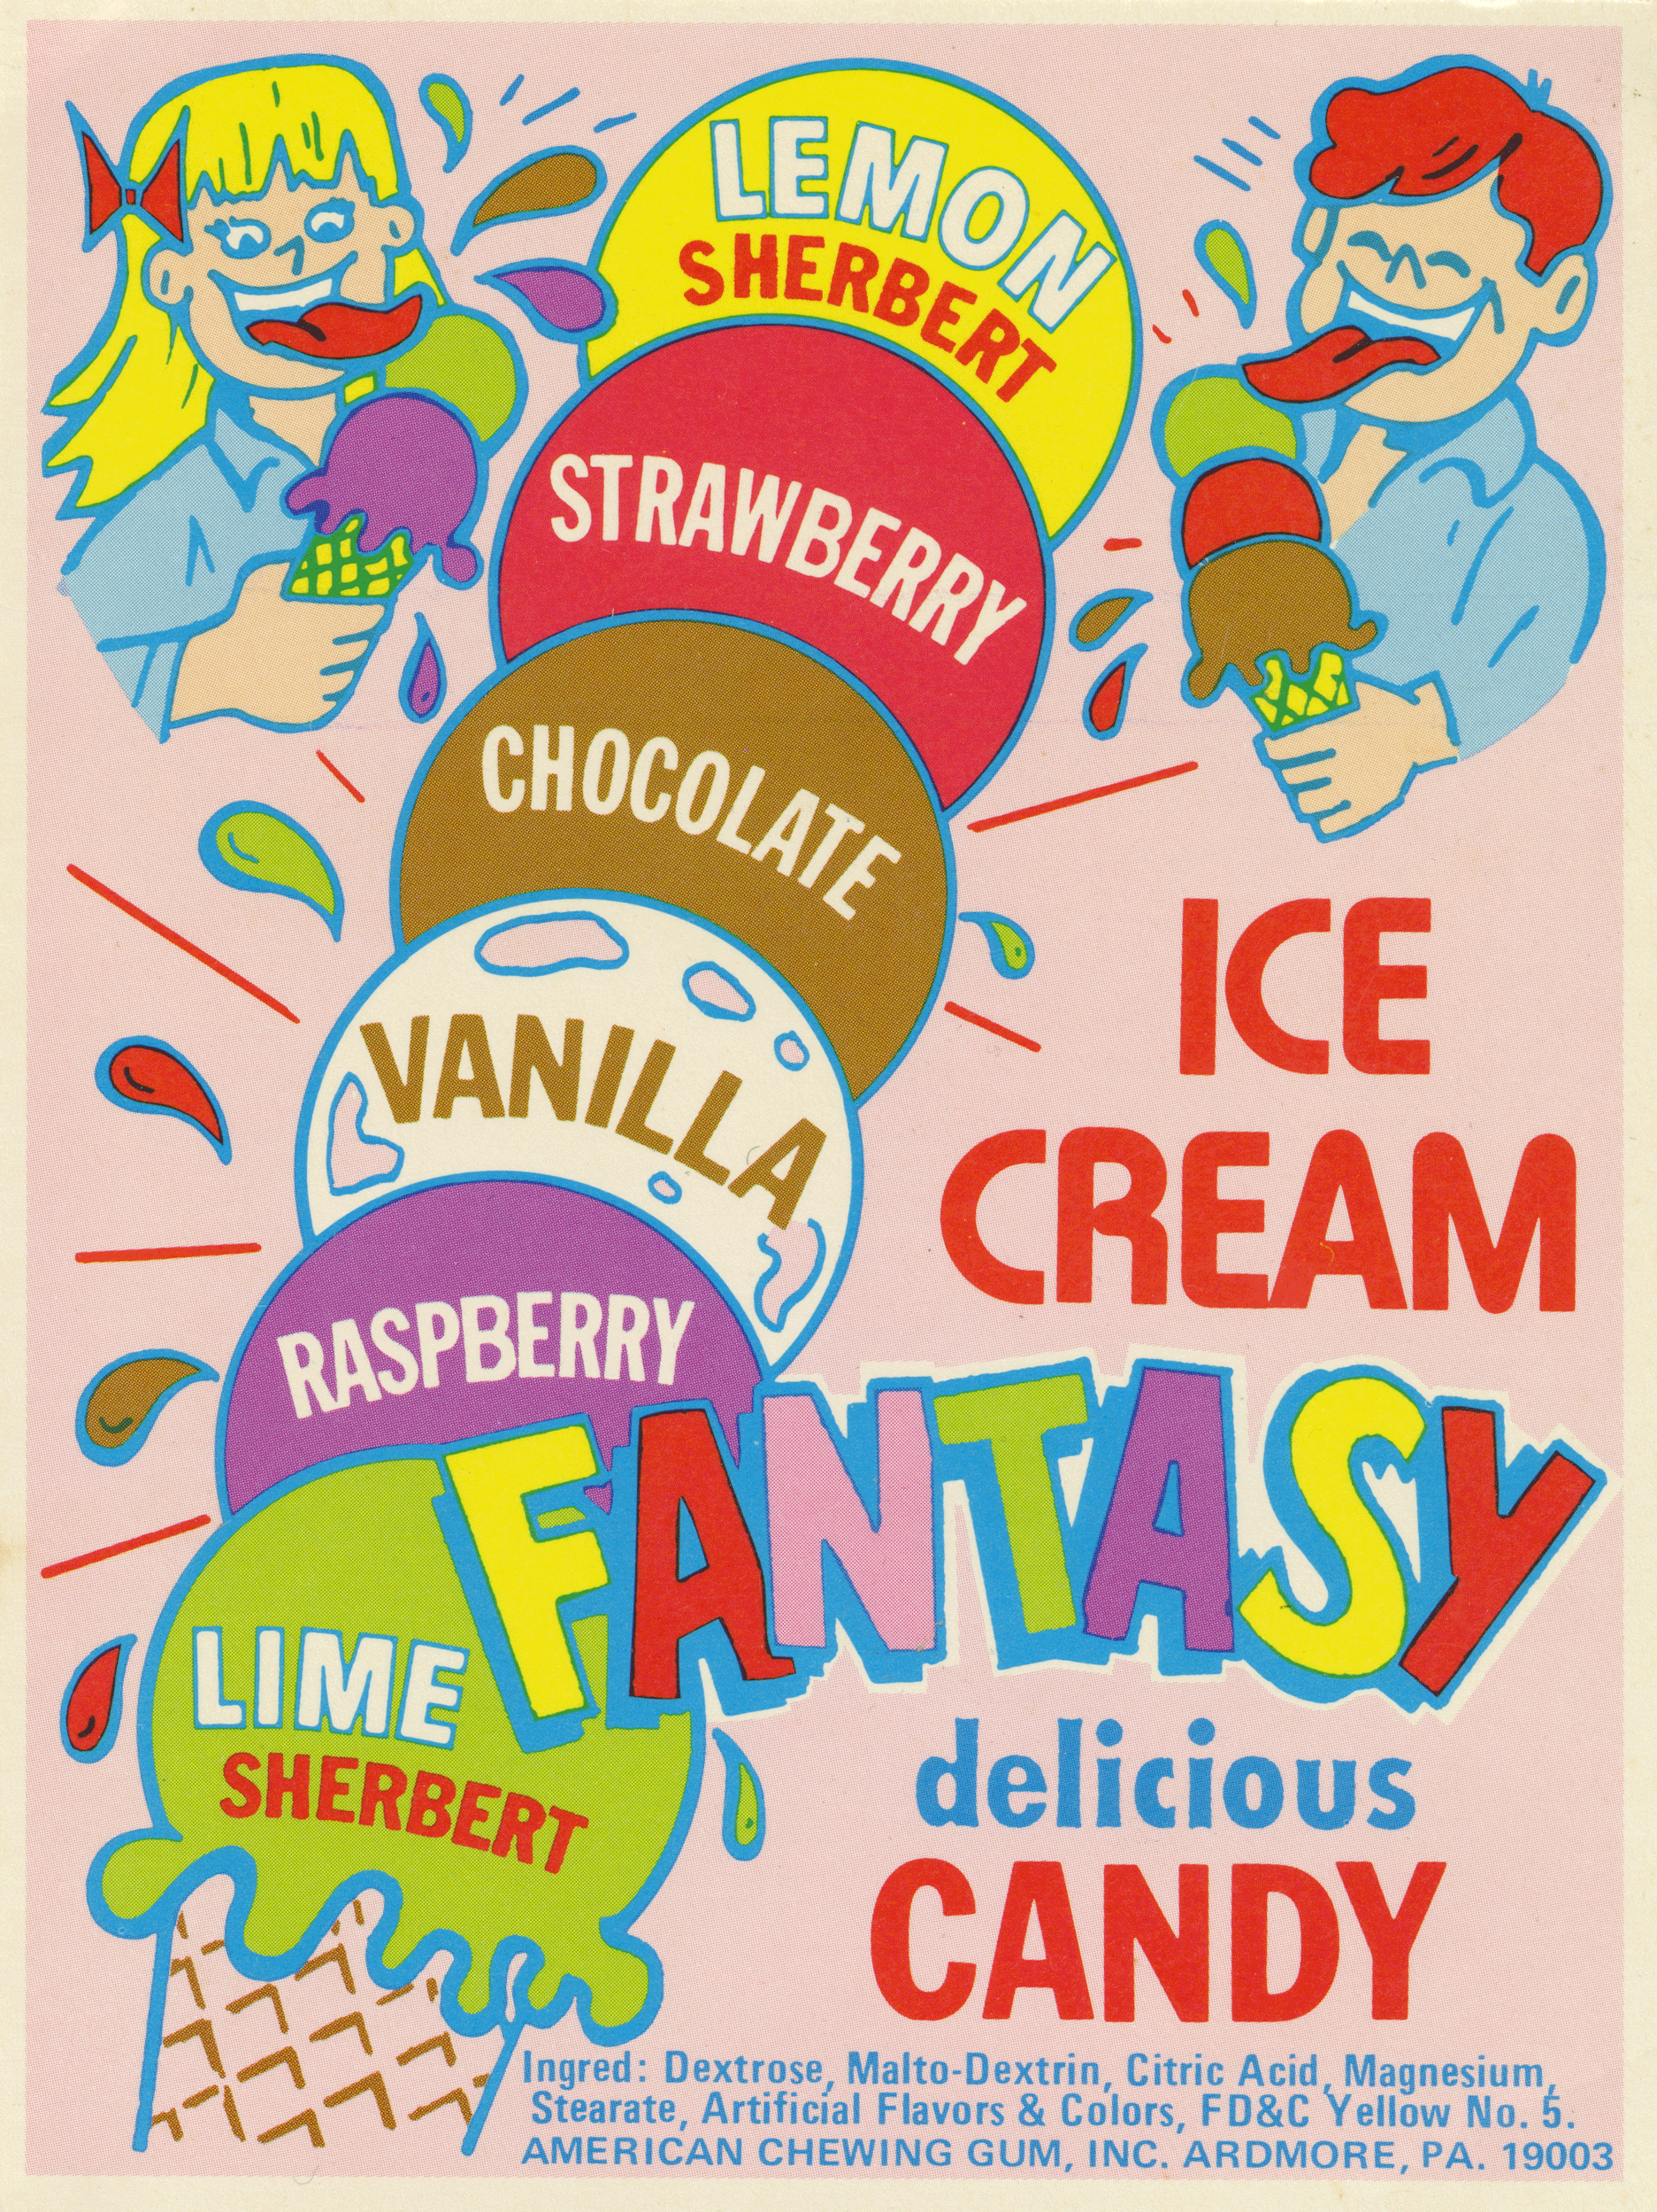 ice-cream-fantasy_23590600838_o.png